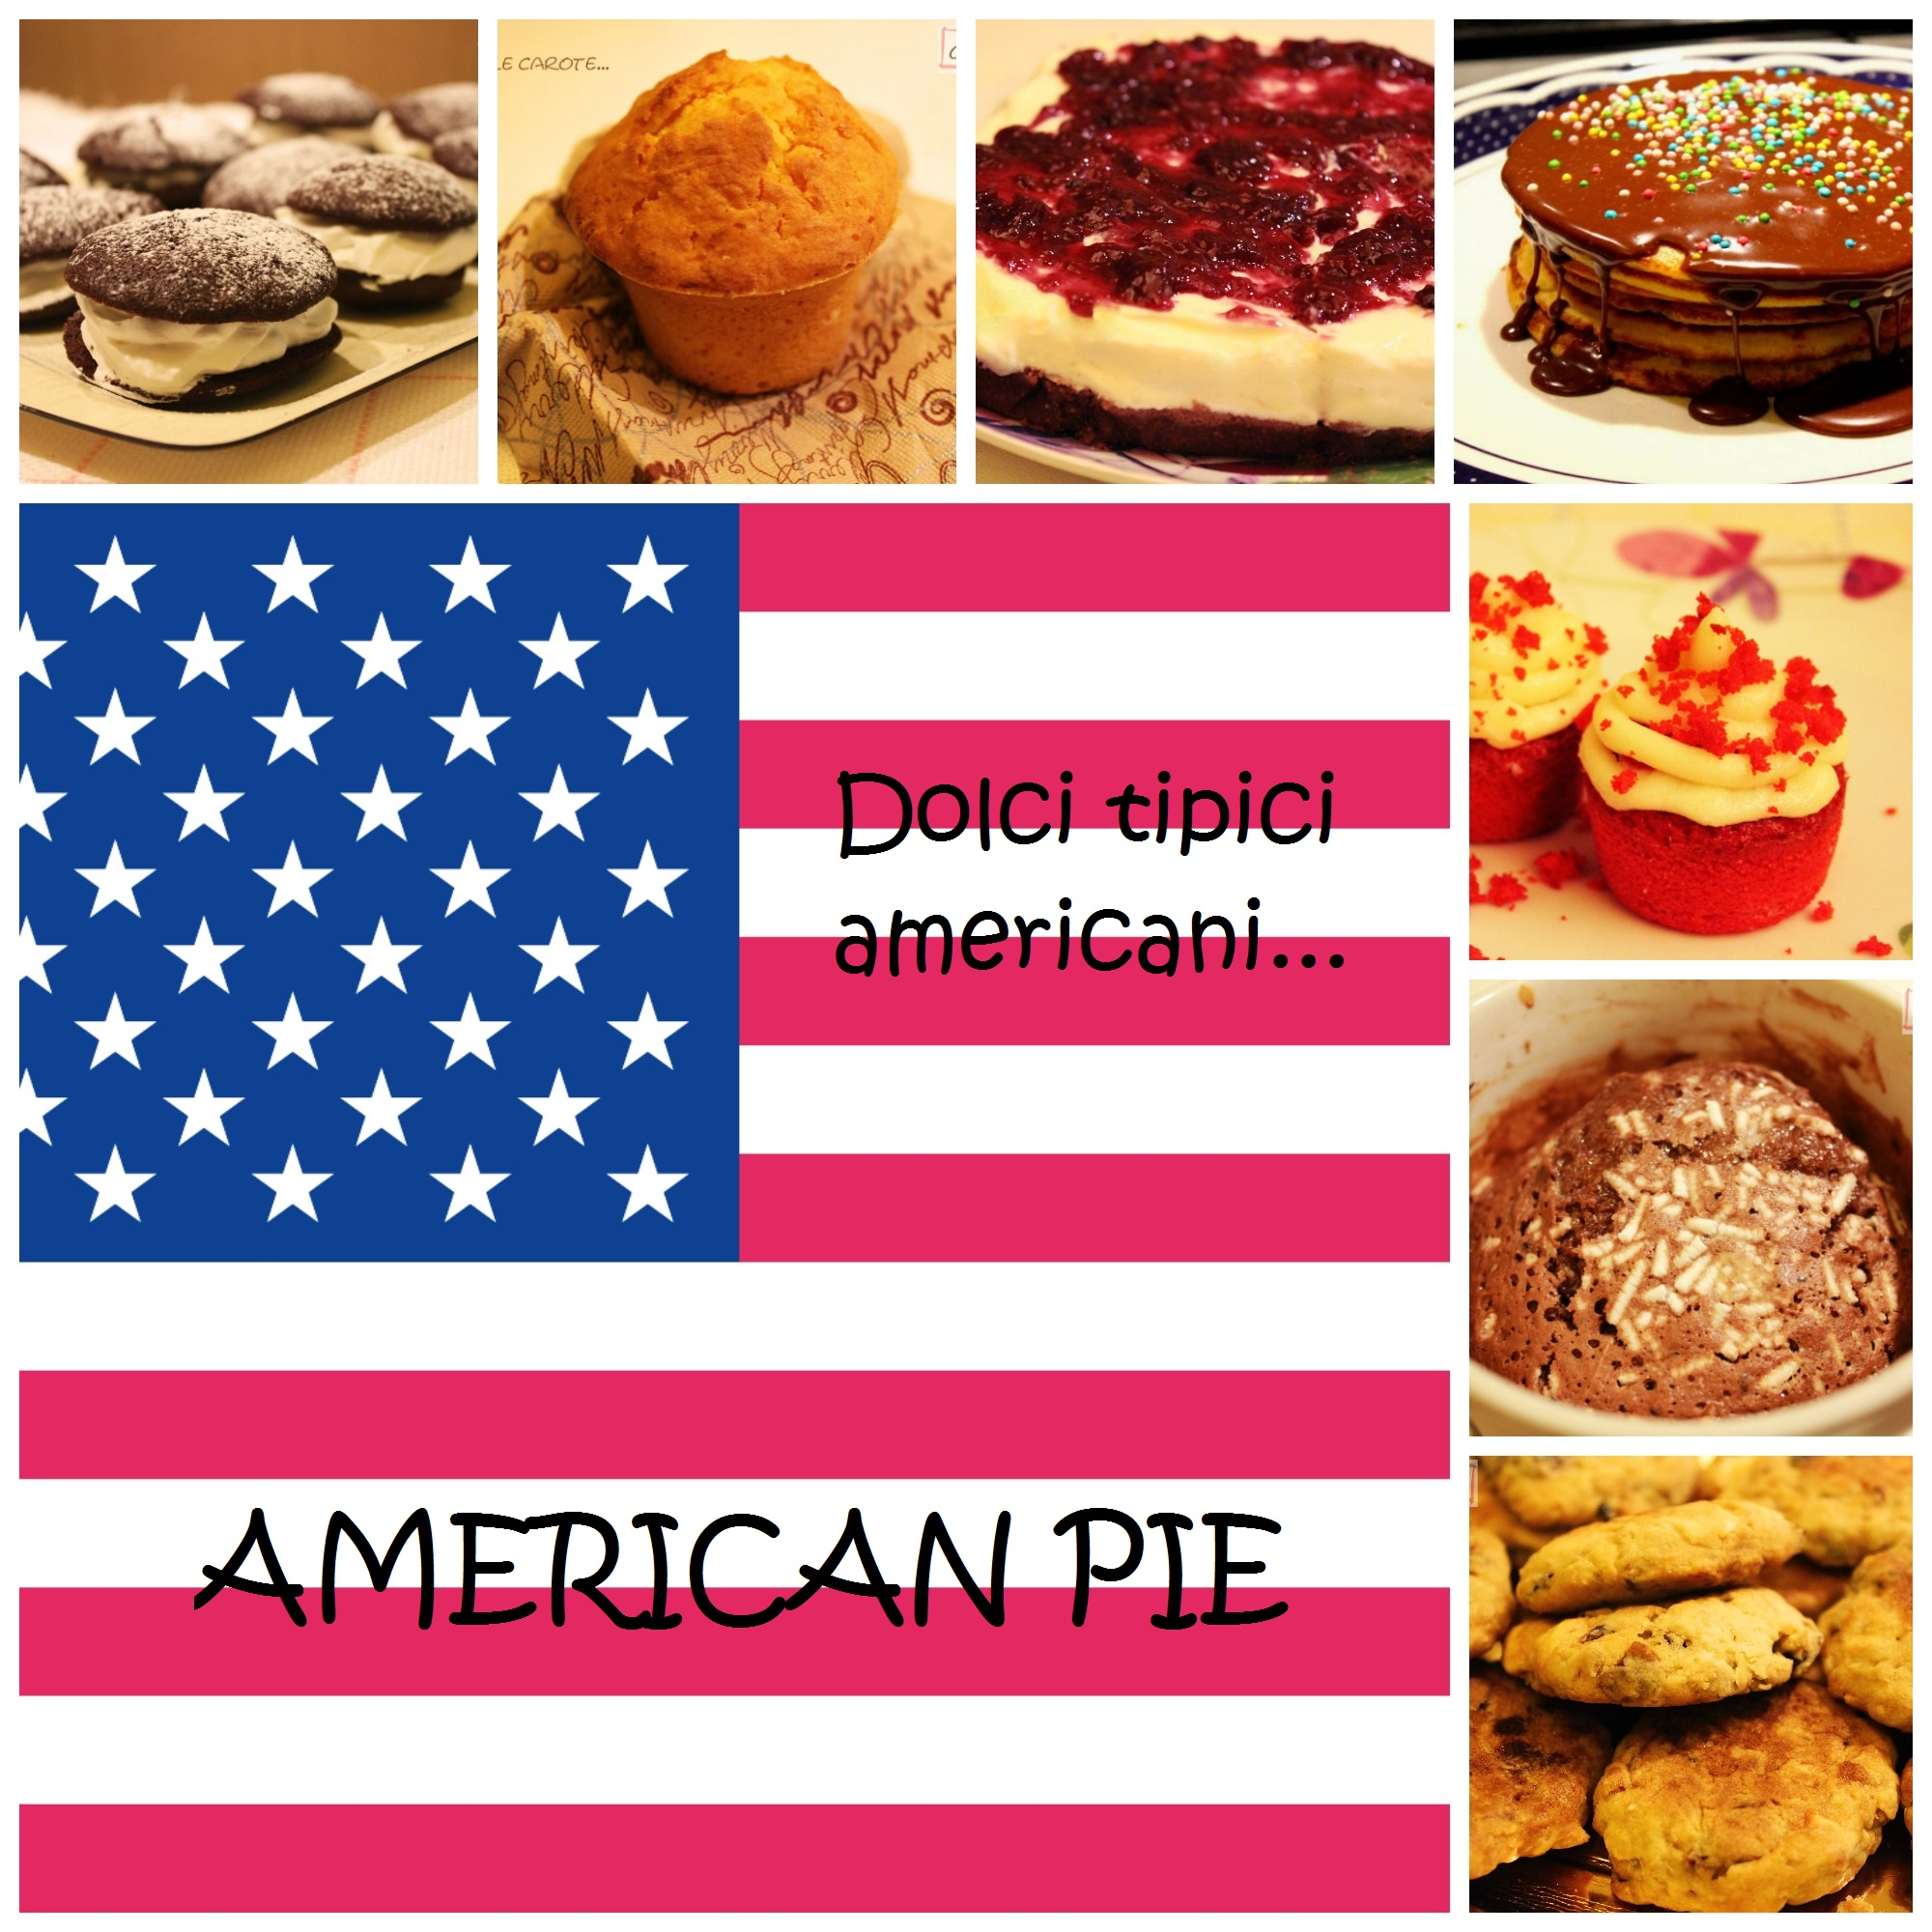 American pie dolci tipici americani a tavola con gianna - Food network ricette a tavola con guy ...